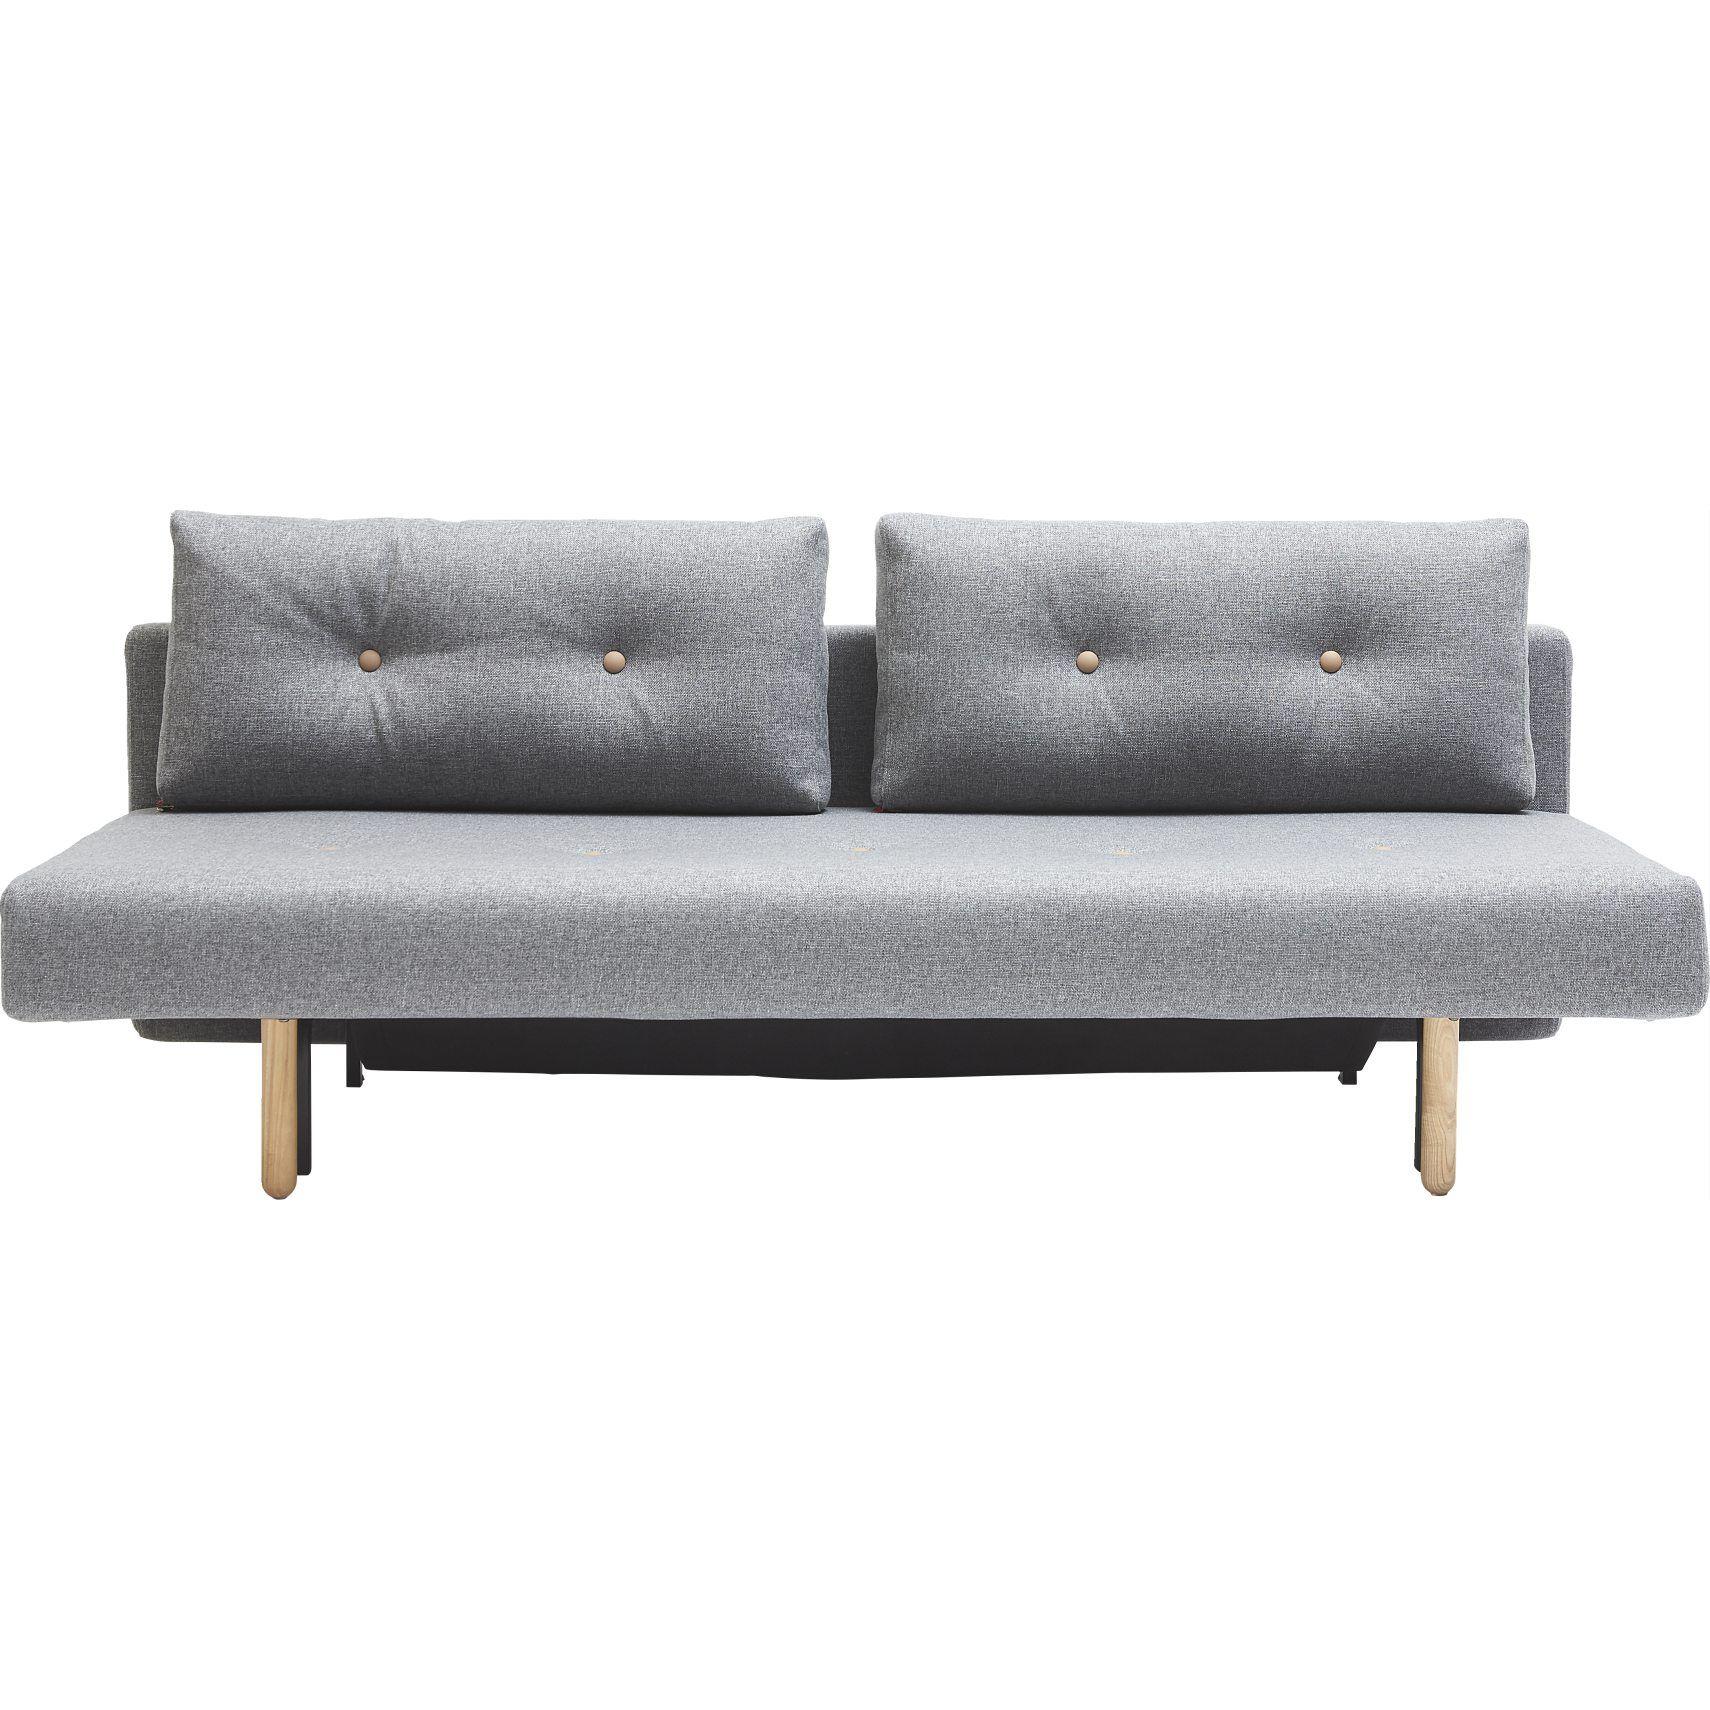 Loke sovesofa fra ILVA. Normalpris 6.700 kr, tilbud 5.000   Awesome furniture   Pinterest